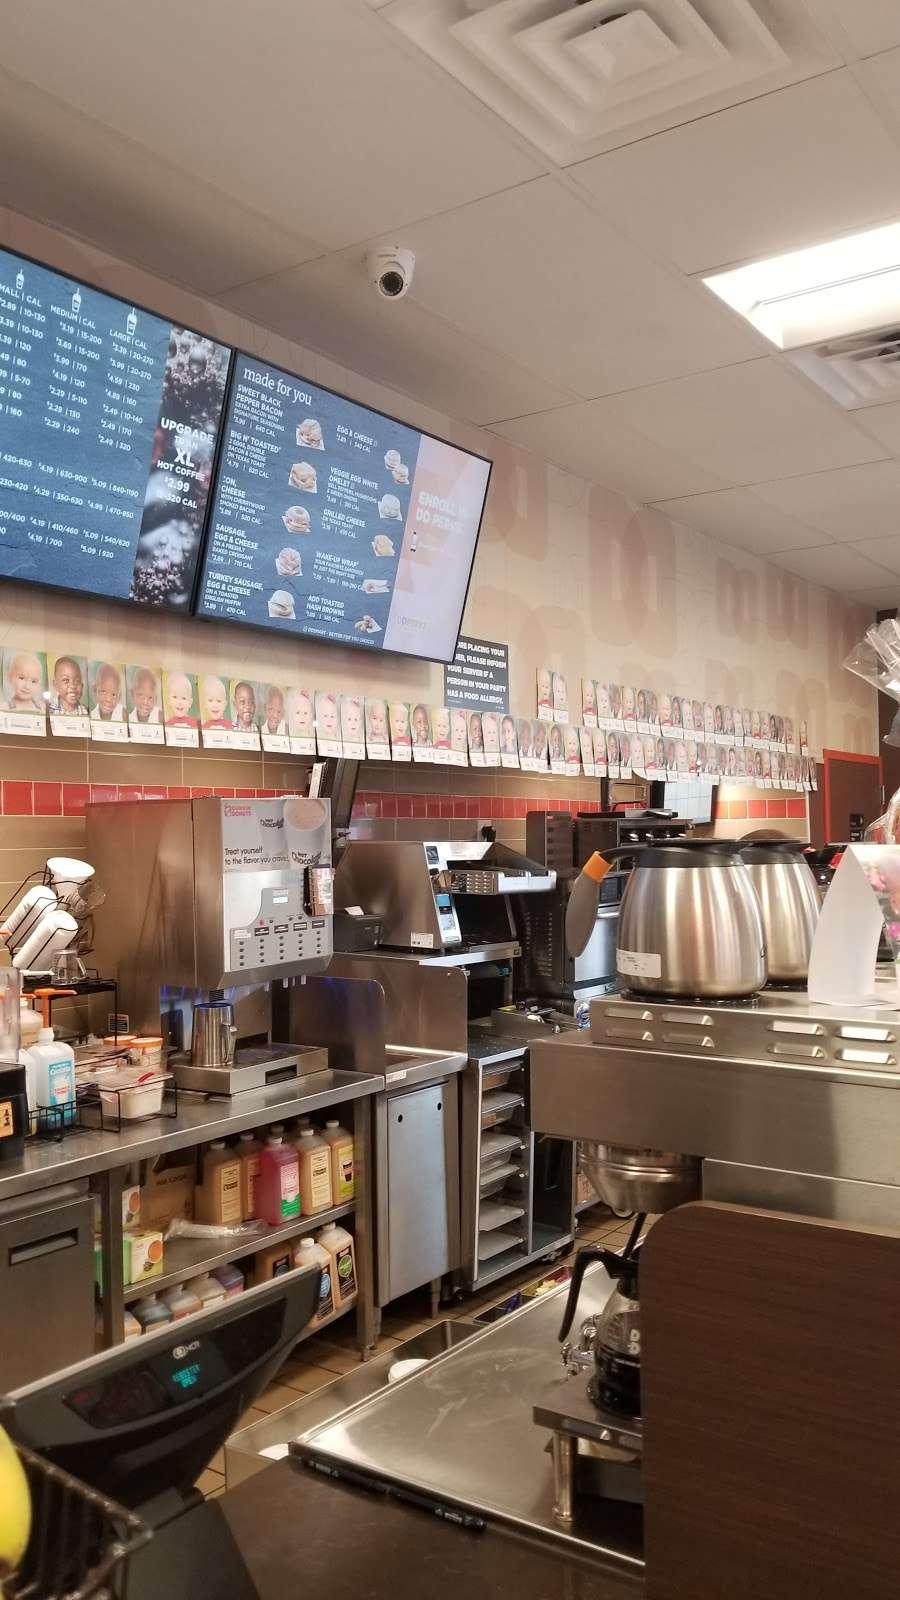 Dunkin Donuts - cafe  | Photo 8 of 10 | Address: 34-21 Greenpoint Ave, Long Island City, NY 11101, USA | Phone: (718) 937-7770